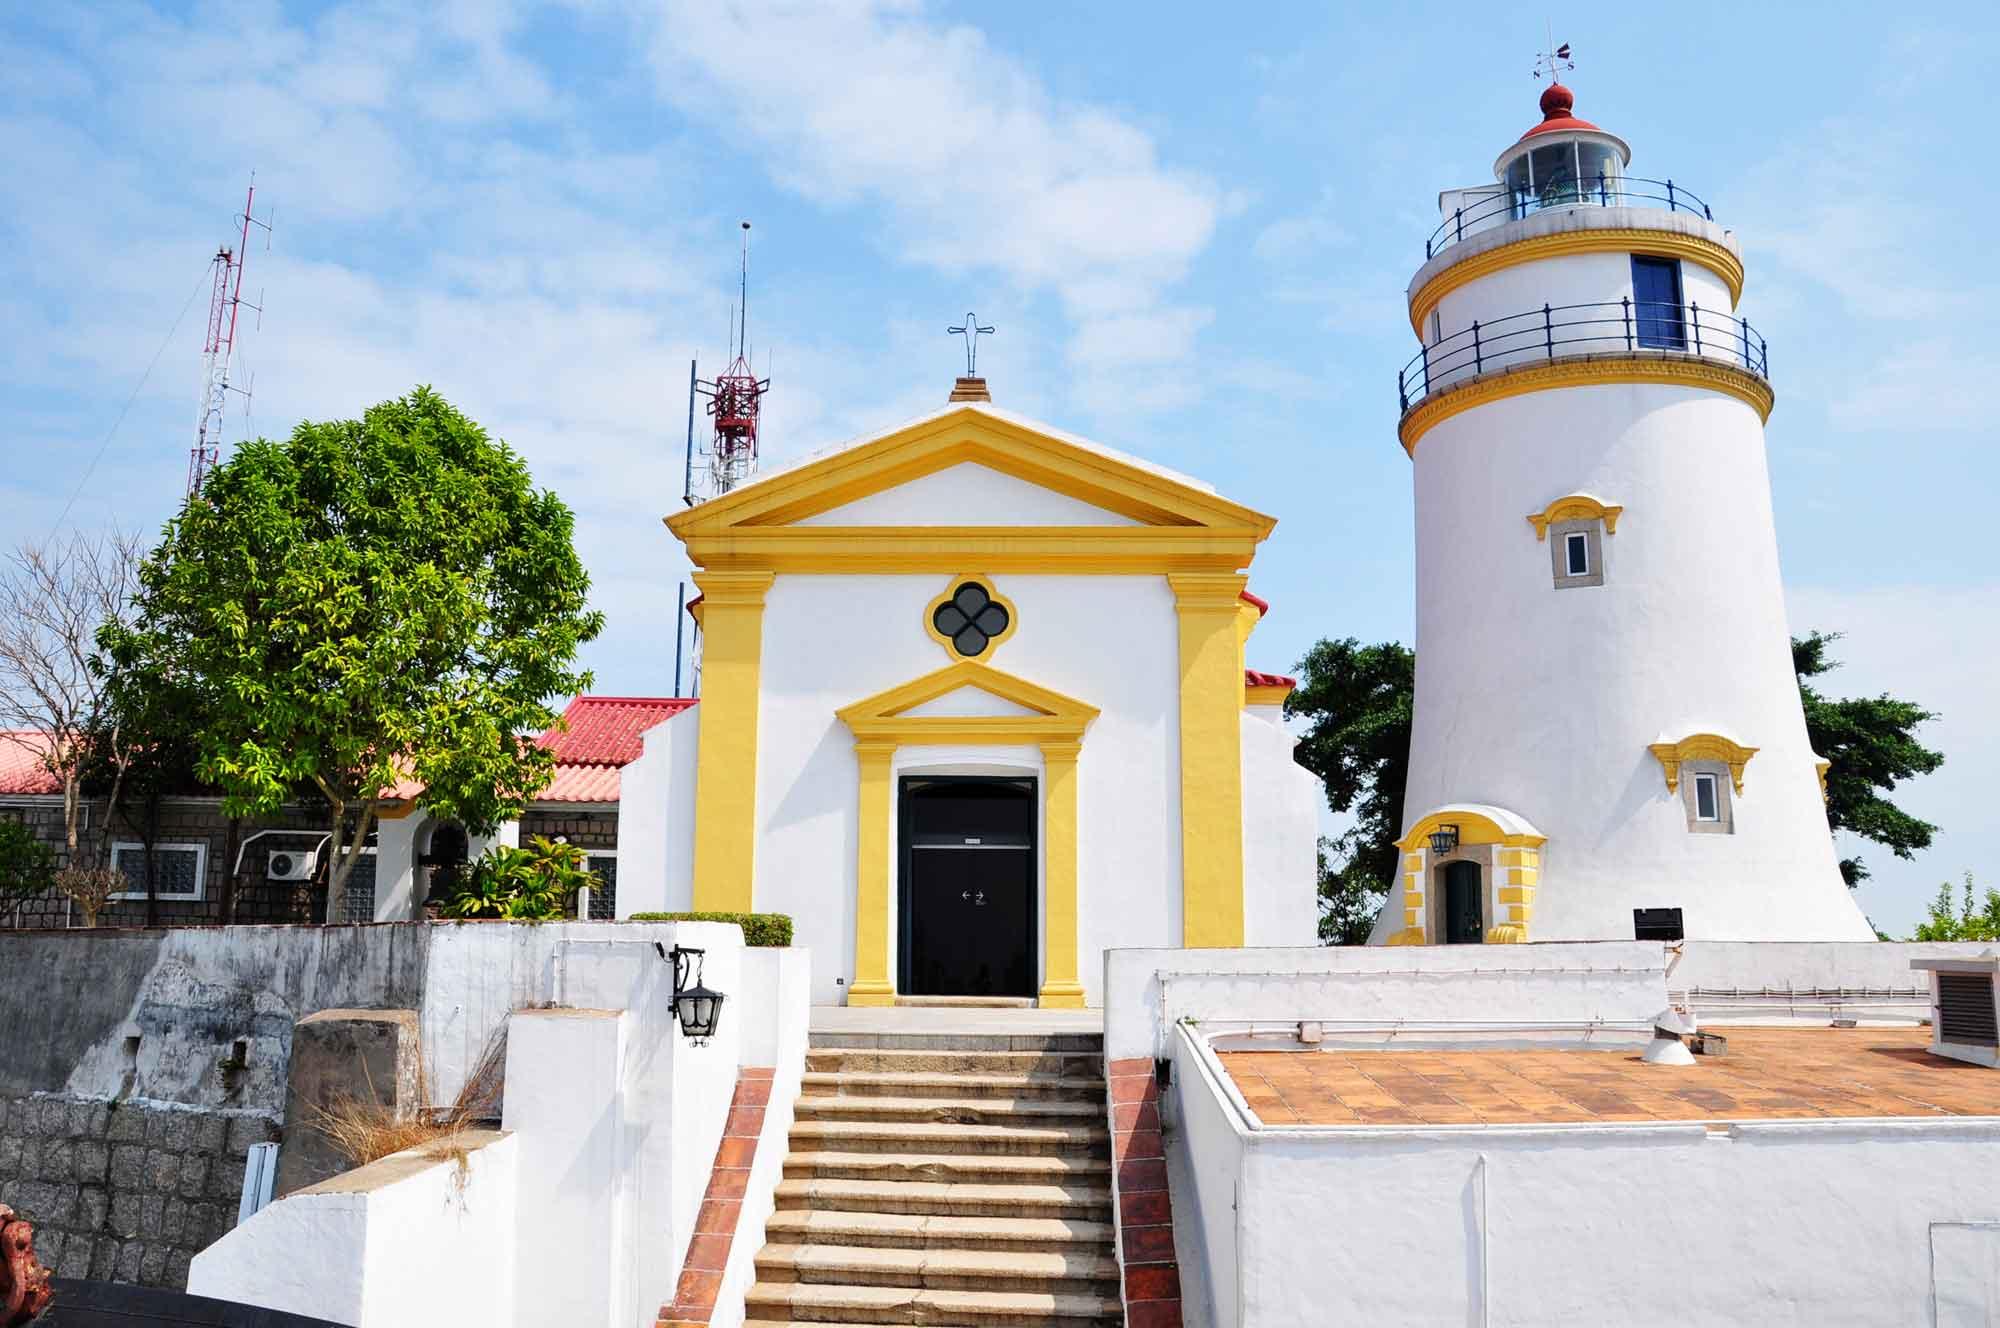 Macau World Heritage Site: Guia Fortress